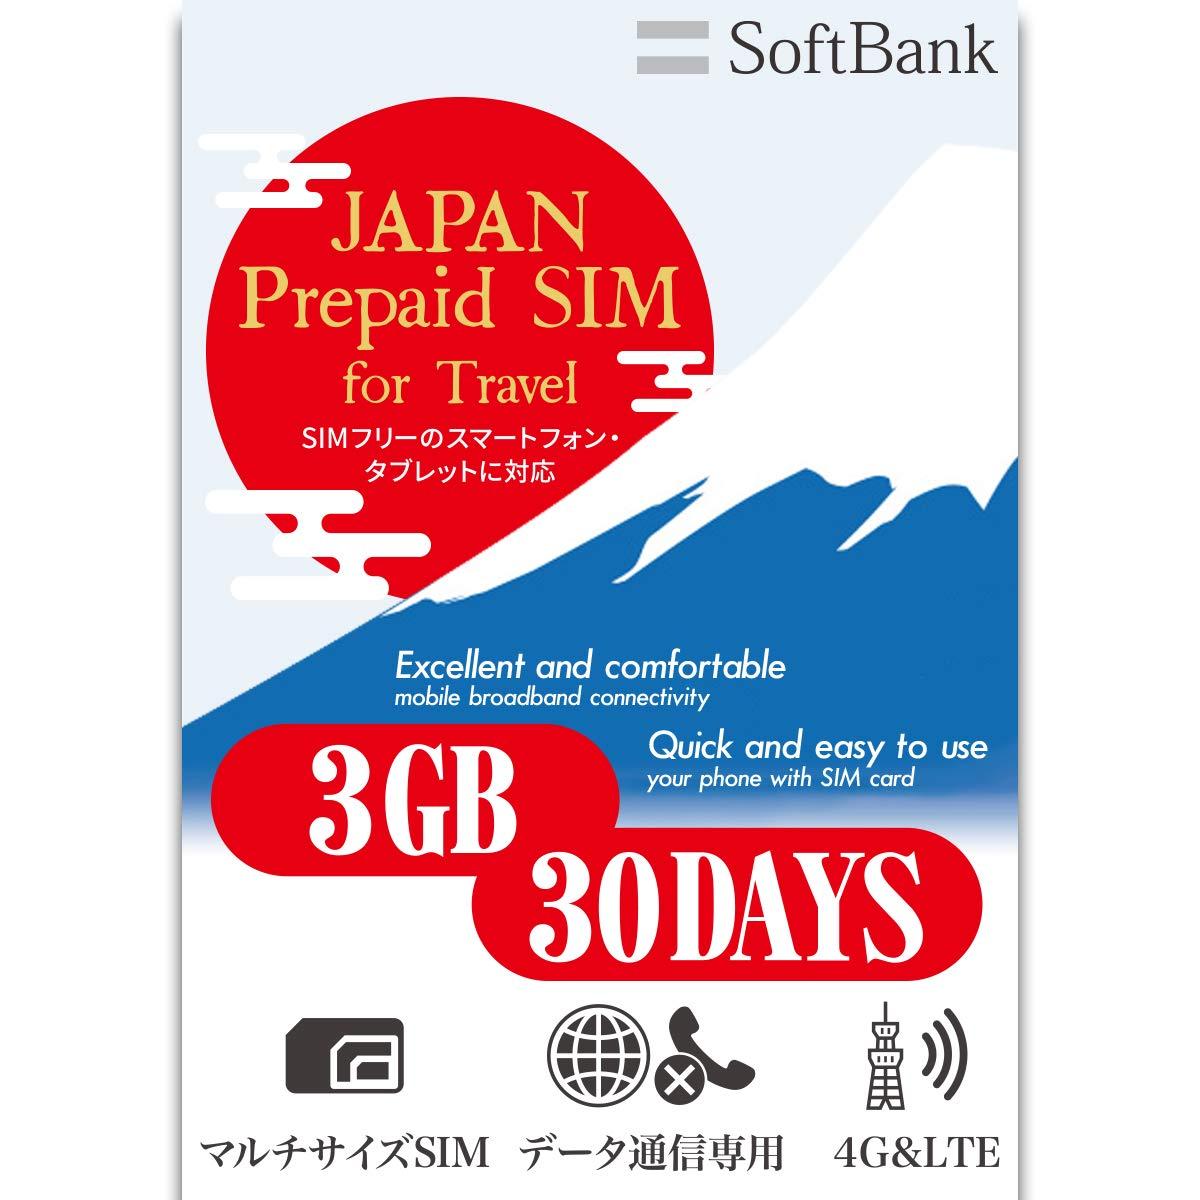 tfn-sim-30-3g プリペイドsim 日本 softbank プリペイドsimカード simカード プリペイド sim card 3GB 30日 マルチカットsim MicroSIM NanoSIM ソフトバンク 携帯 携帯電話